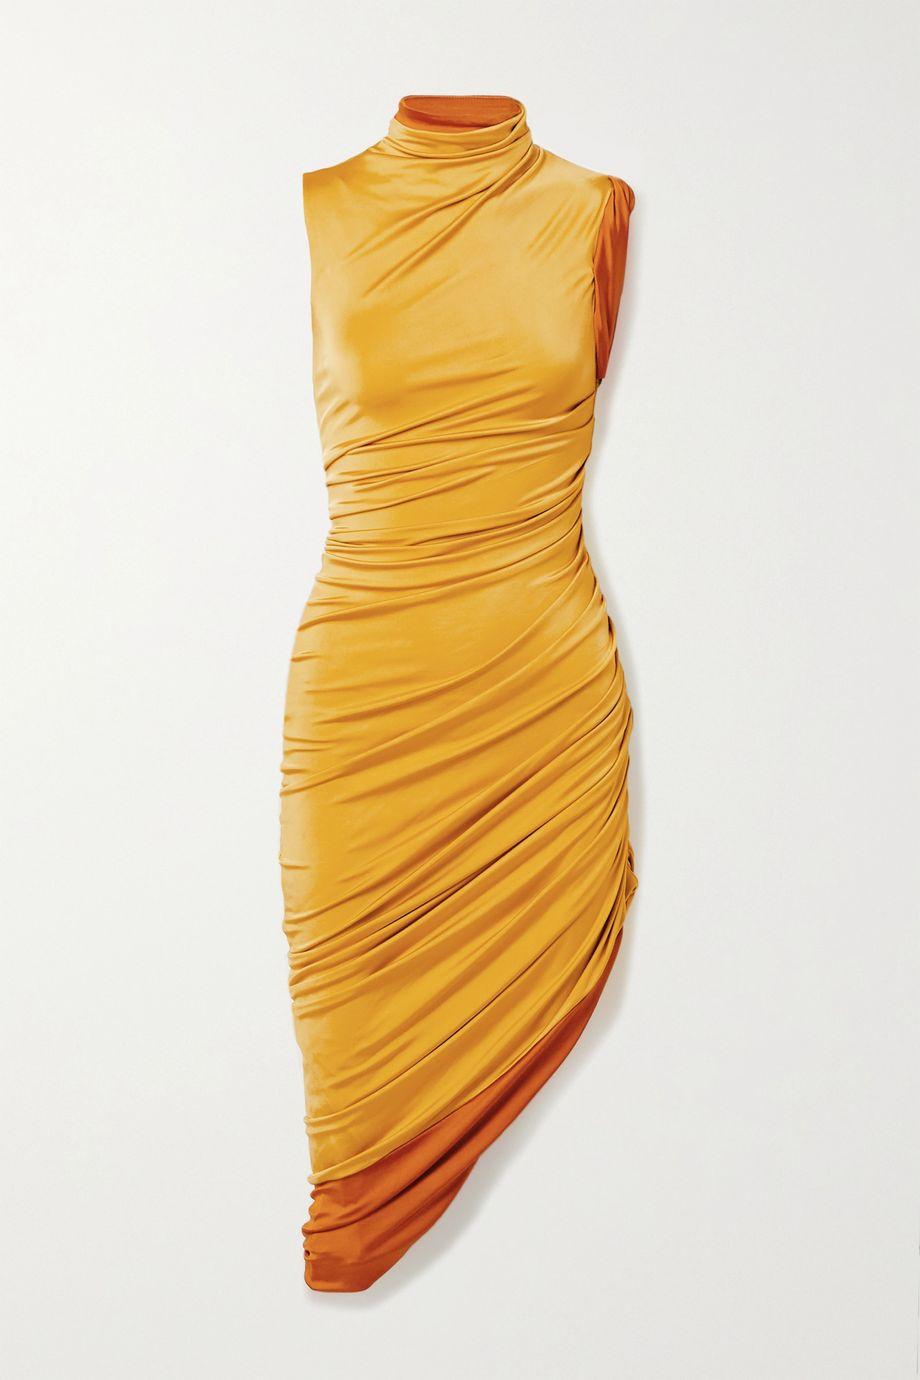 Monse Ruched stretch-jersey turtleneck dress